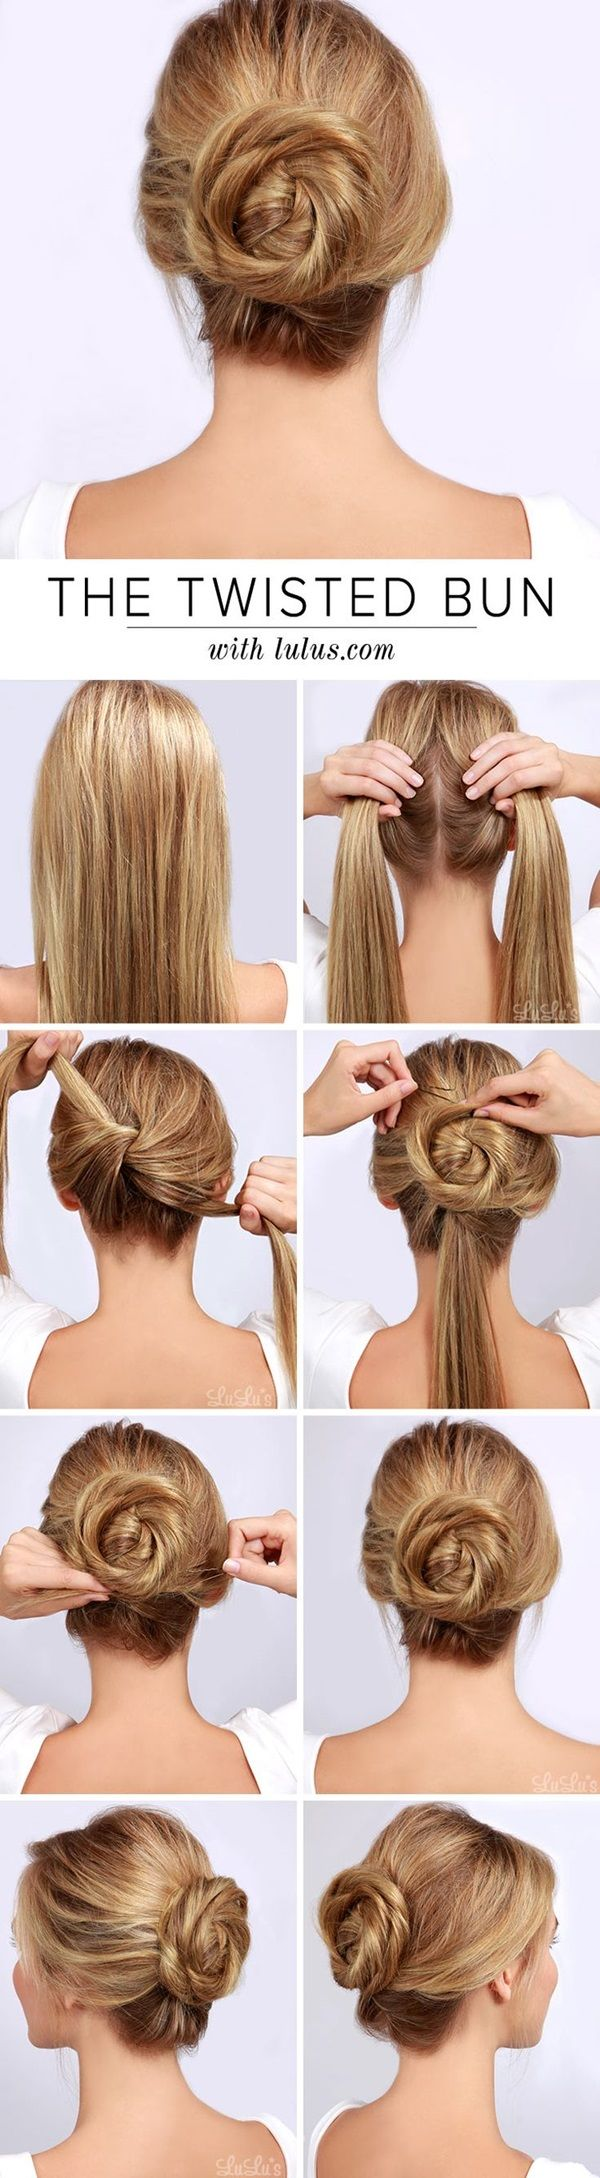 25 Best Ideas About Easy Bun Hairstyles On Pinterest Bun